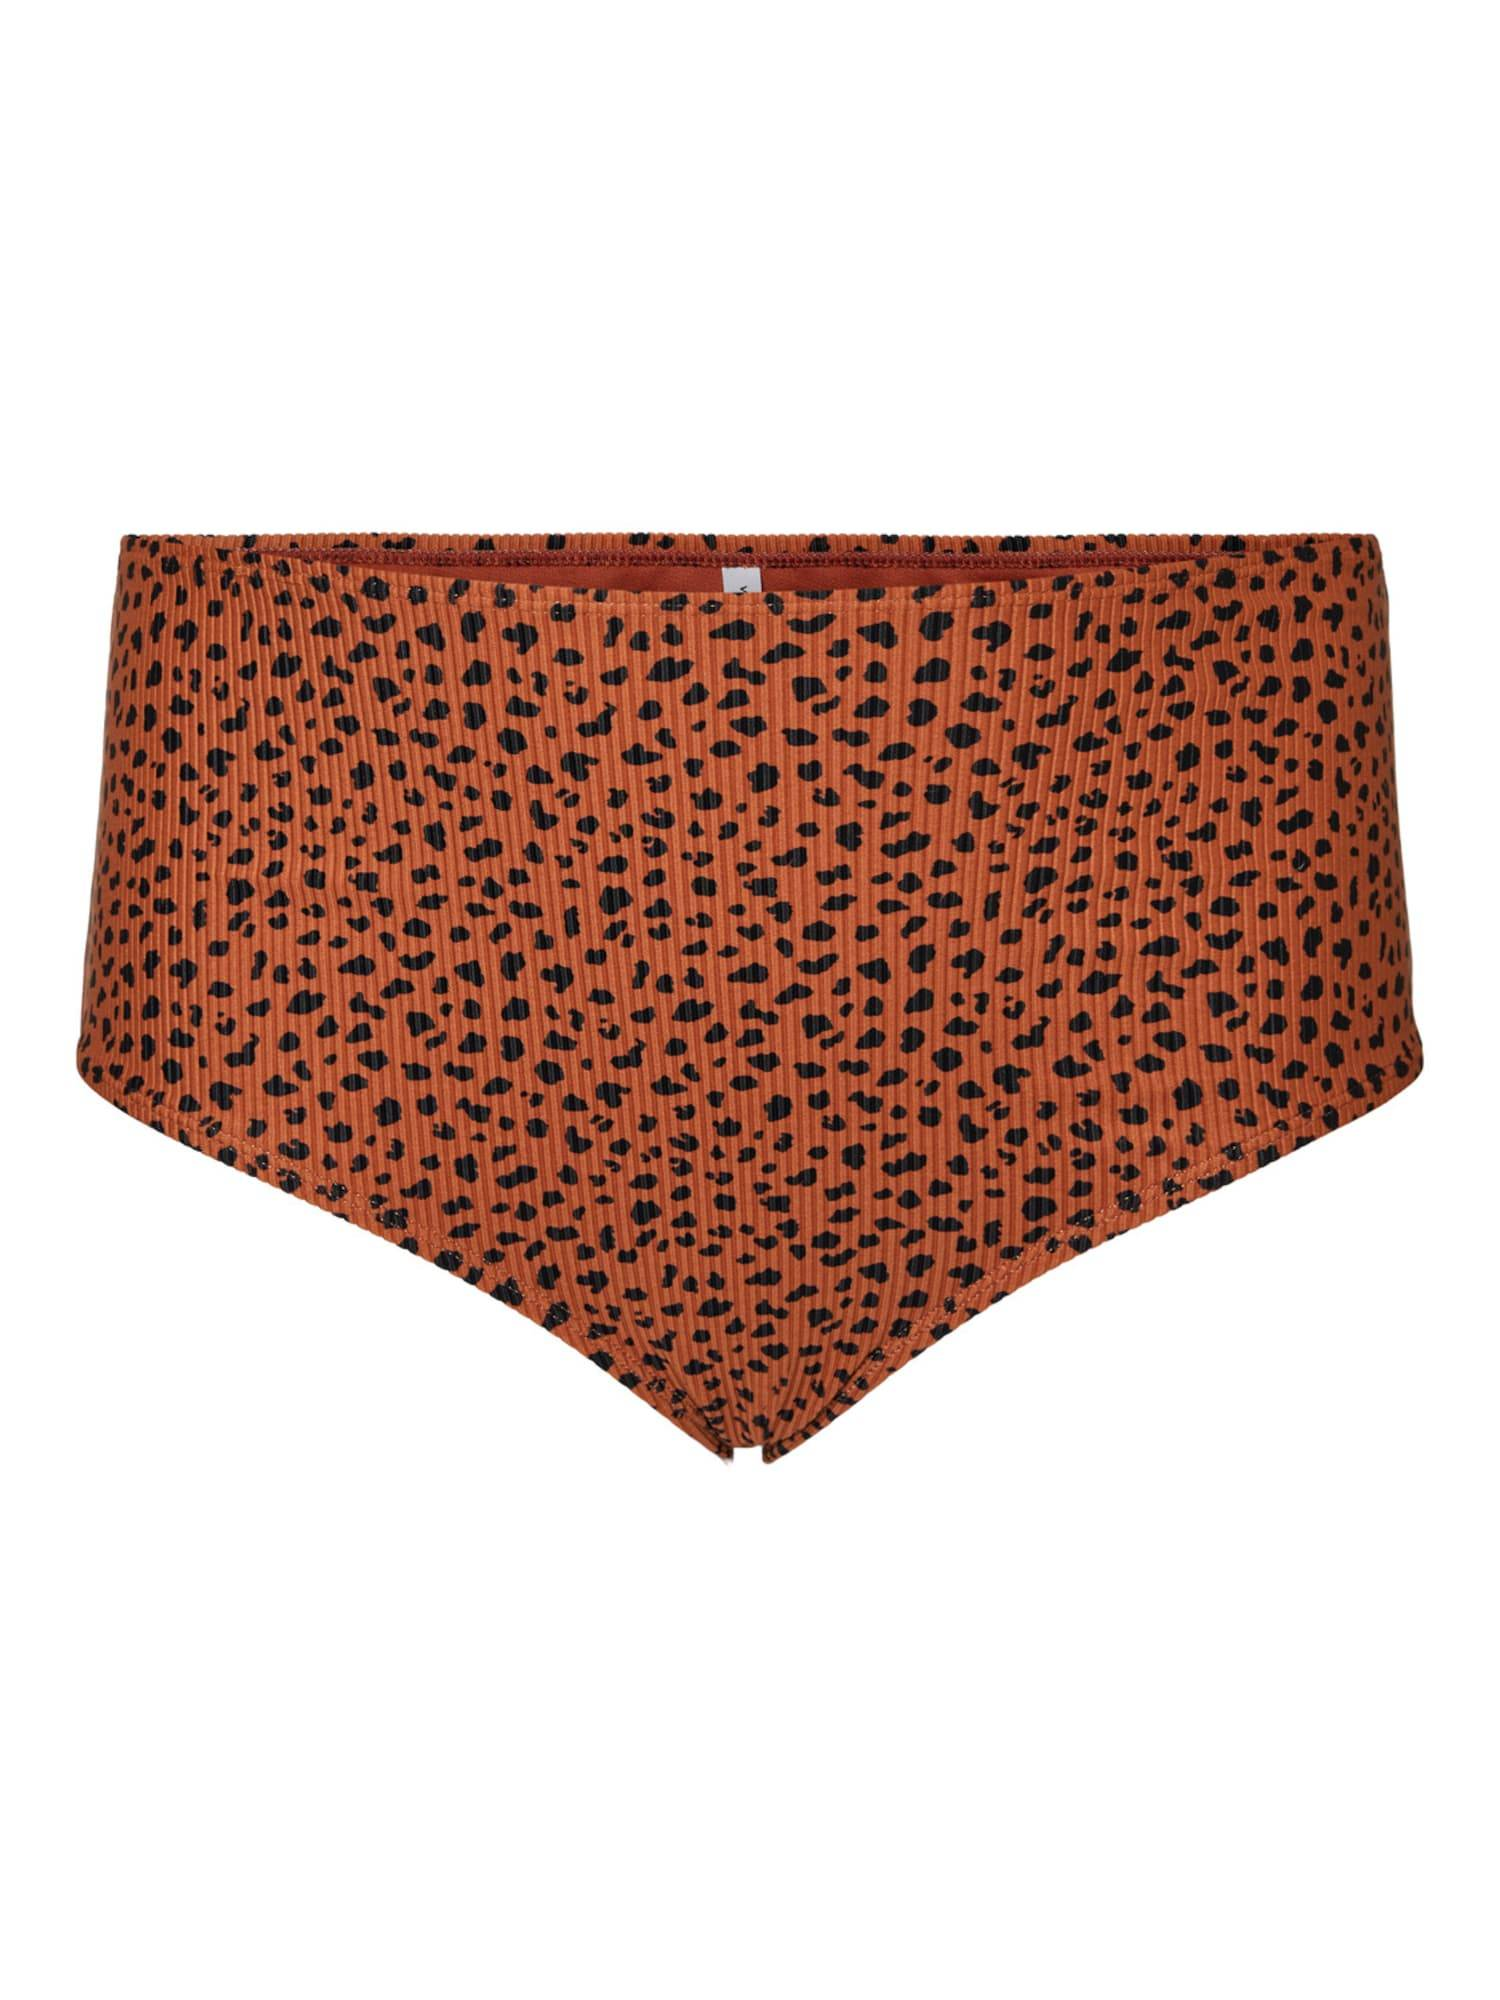 Vero Moda Curve Bas de bikini 'Madison'  - Marron - Taille: 50 - female